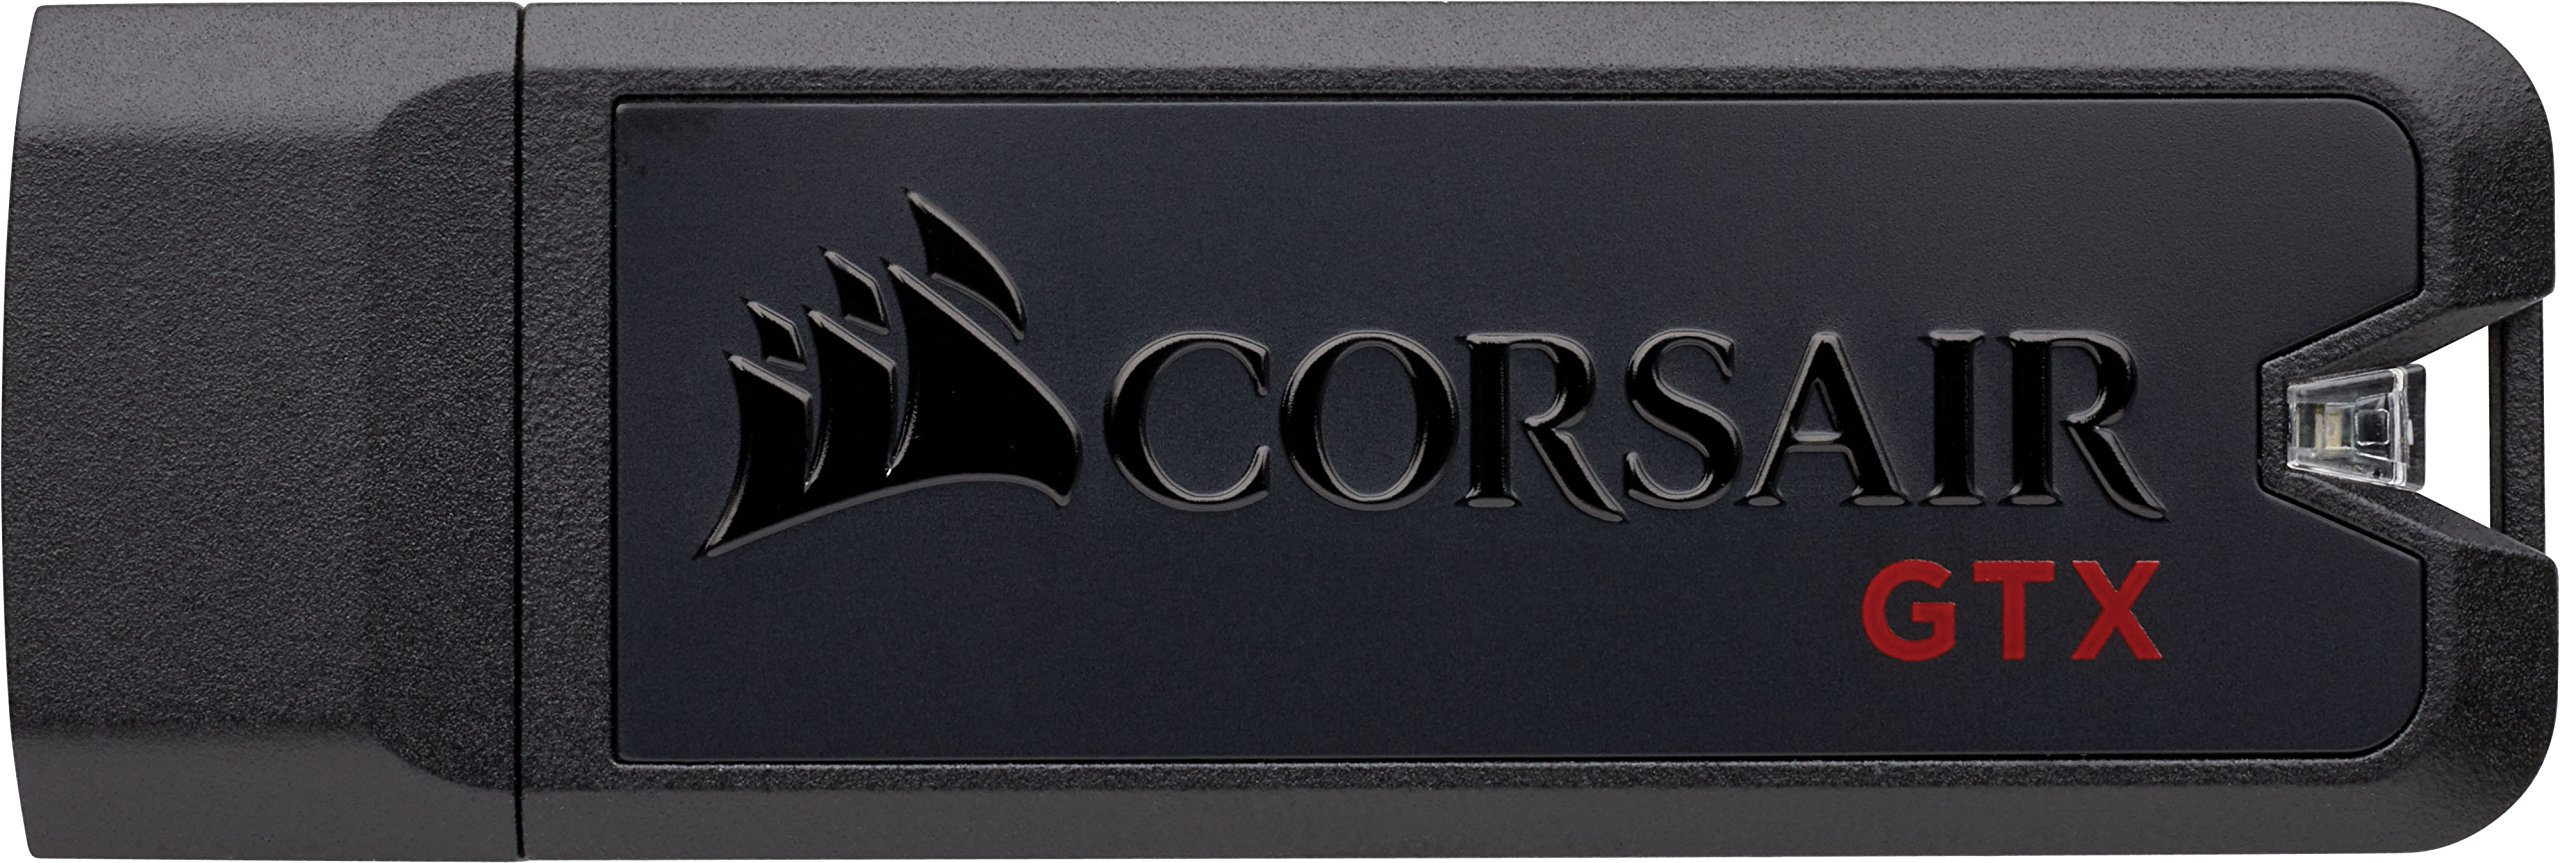 Corsair Flash Voyager GTX 128GB USB 3.1 Premium Flash Drive by Corsair (Image #2)